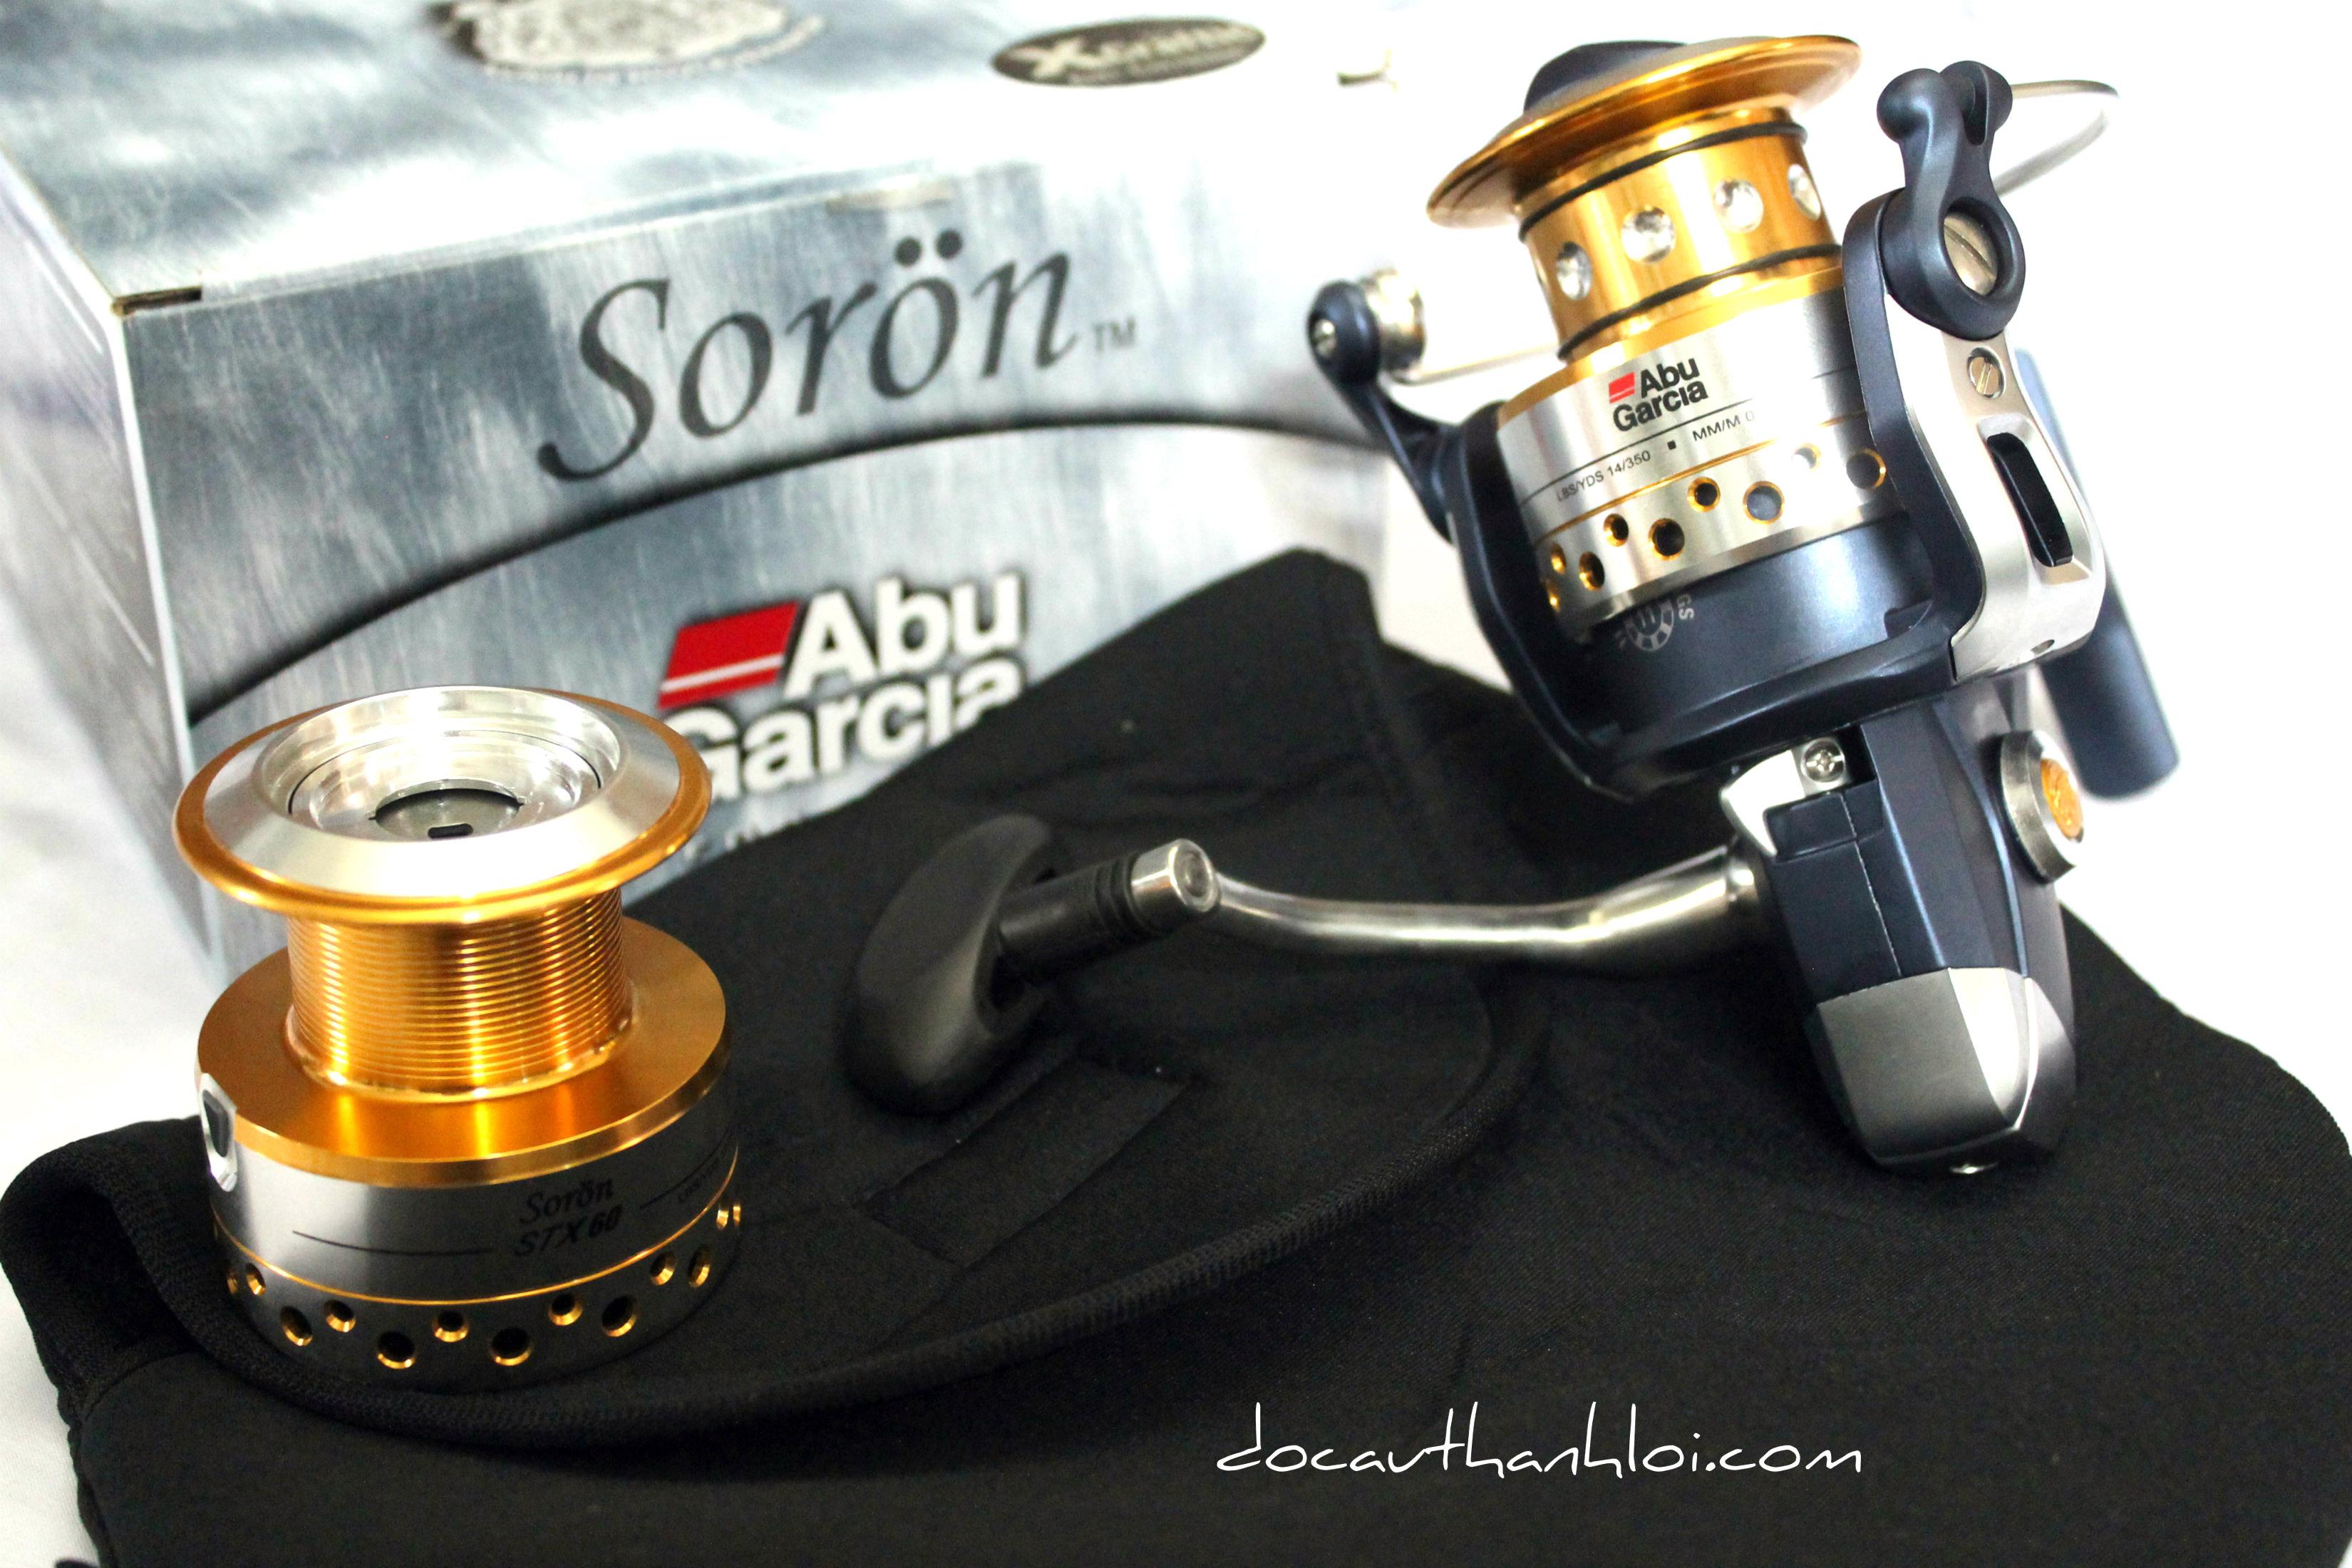 Máy ABU SORON STX 60